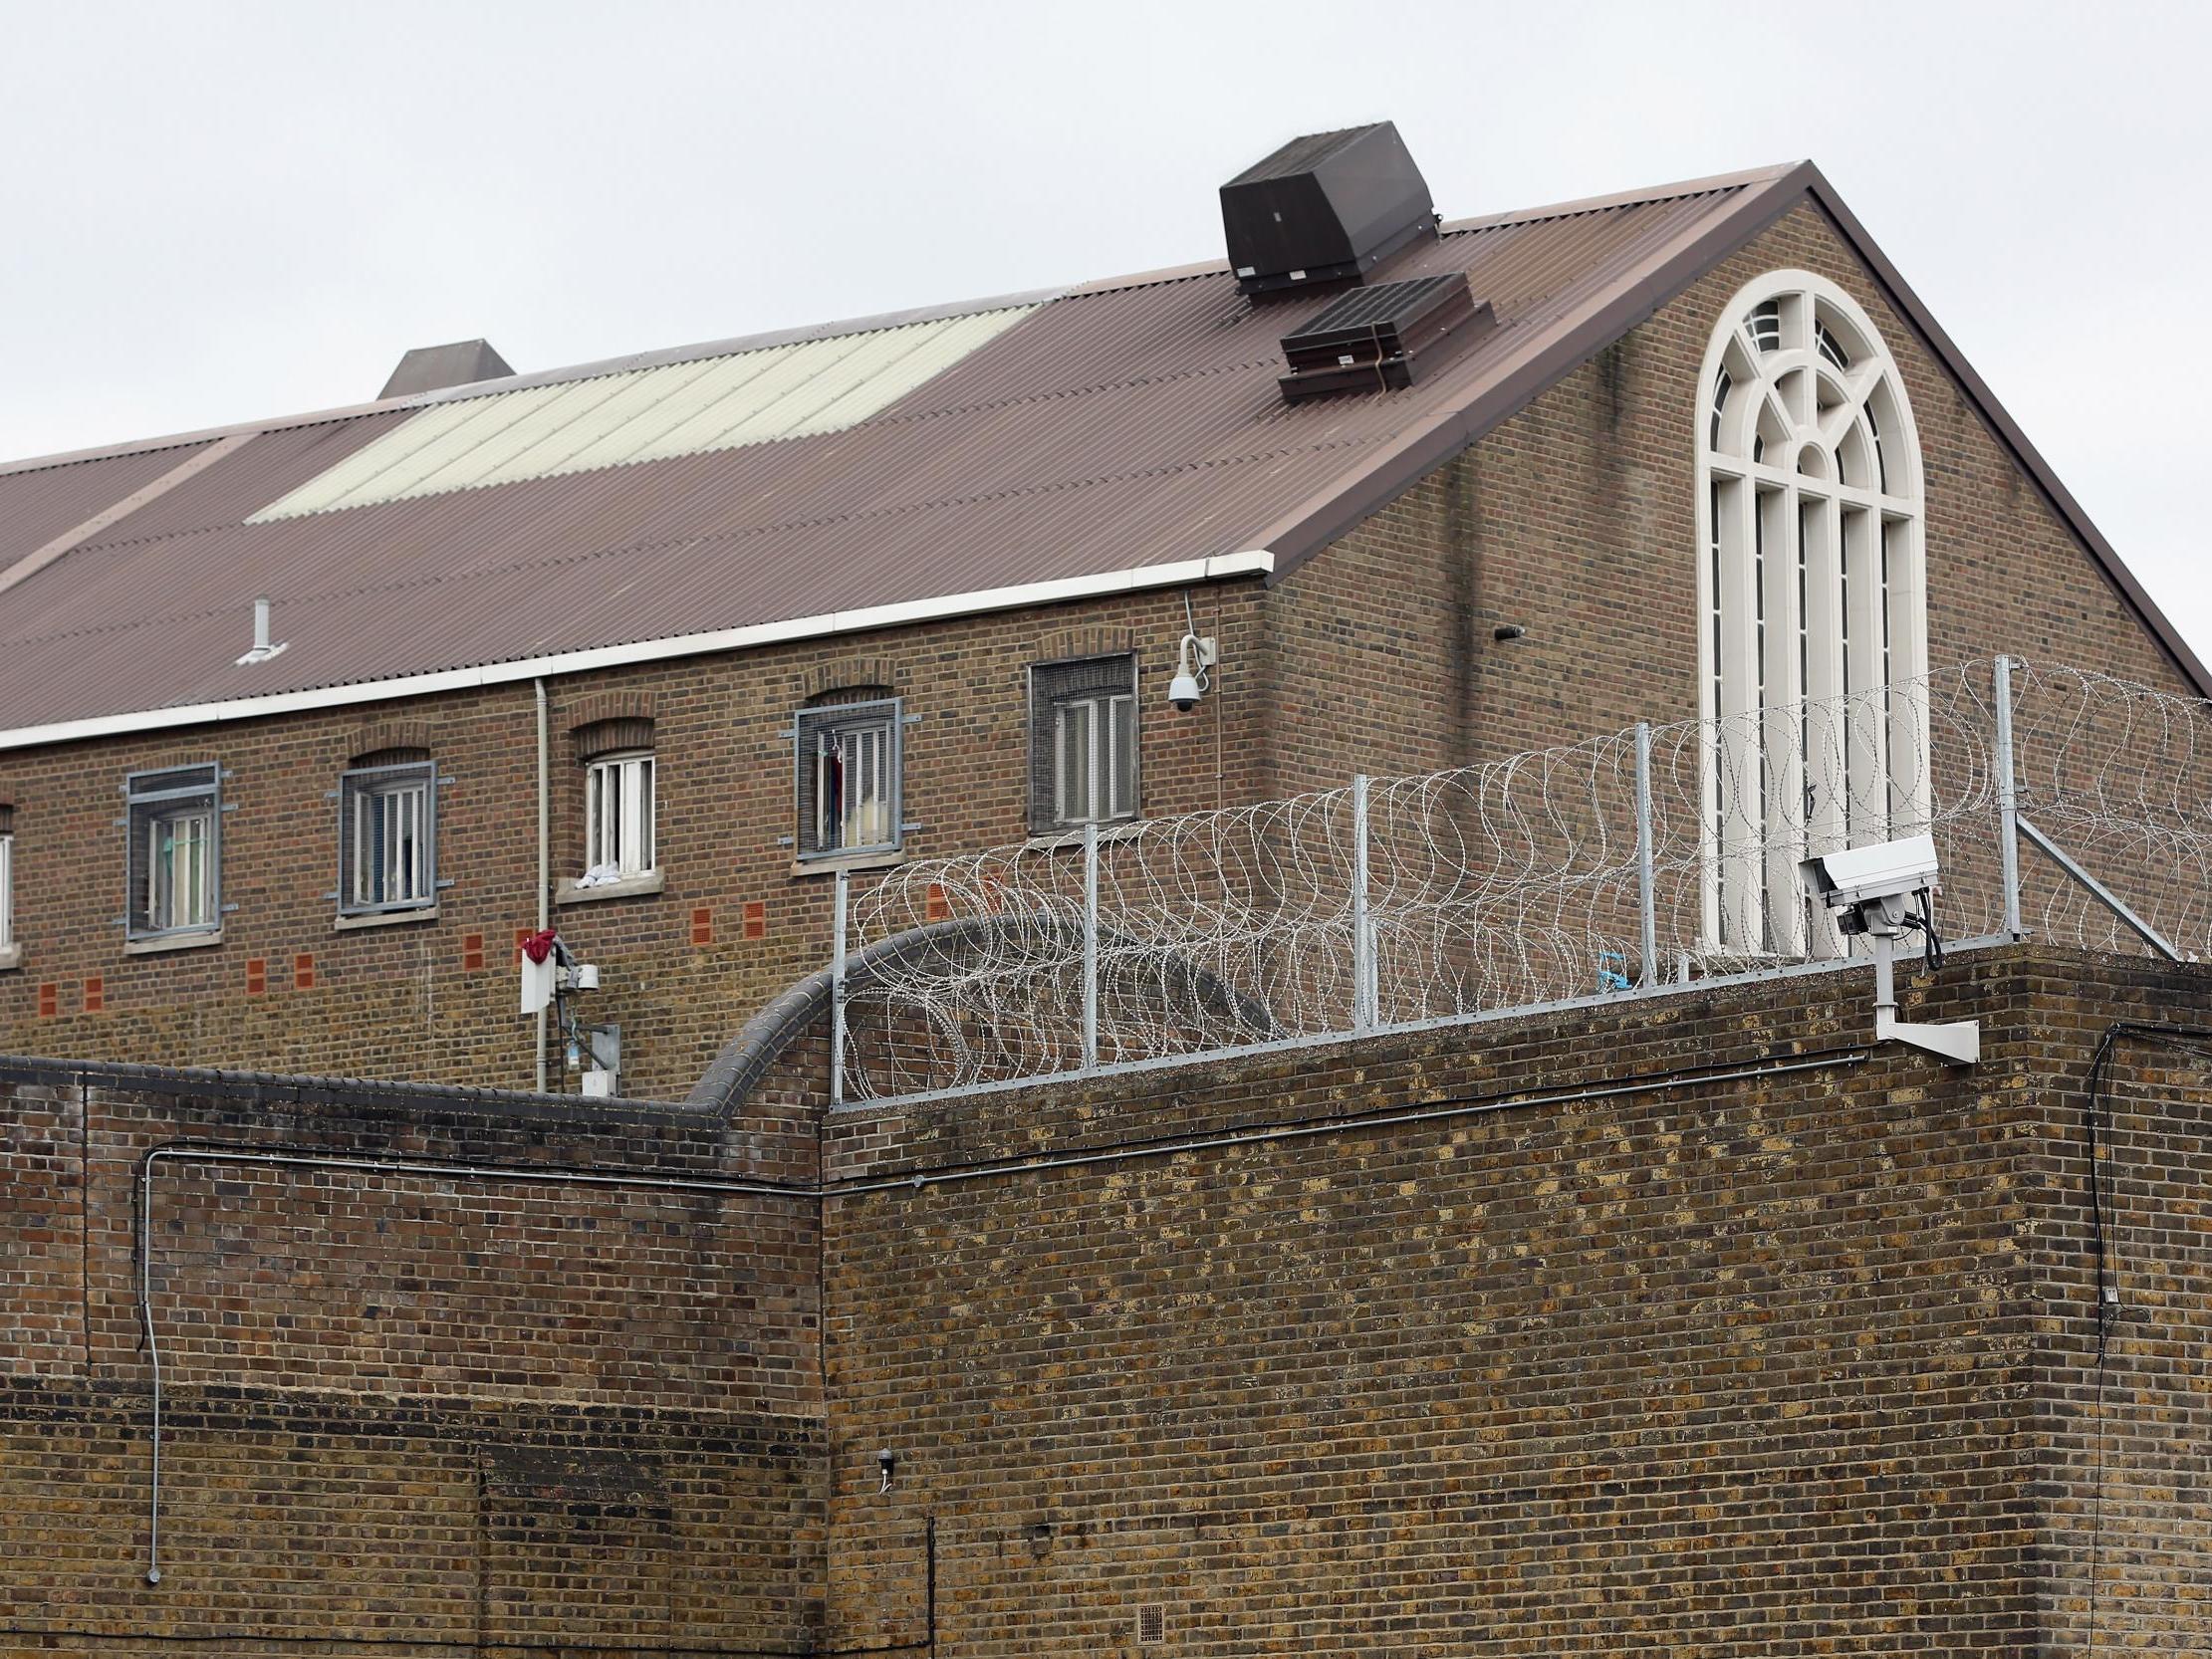 Prisoner suicides surge by 23%, official figures reveal